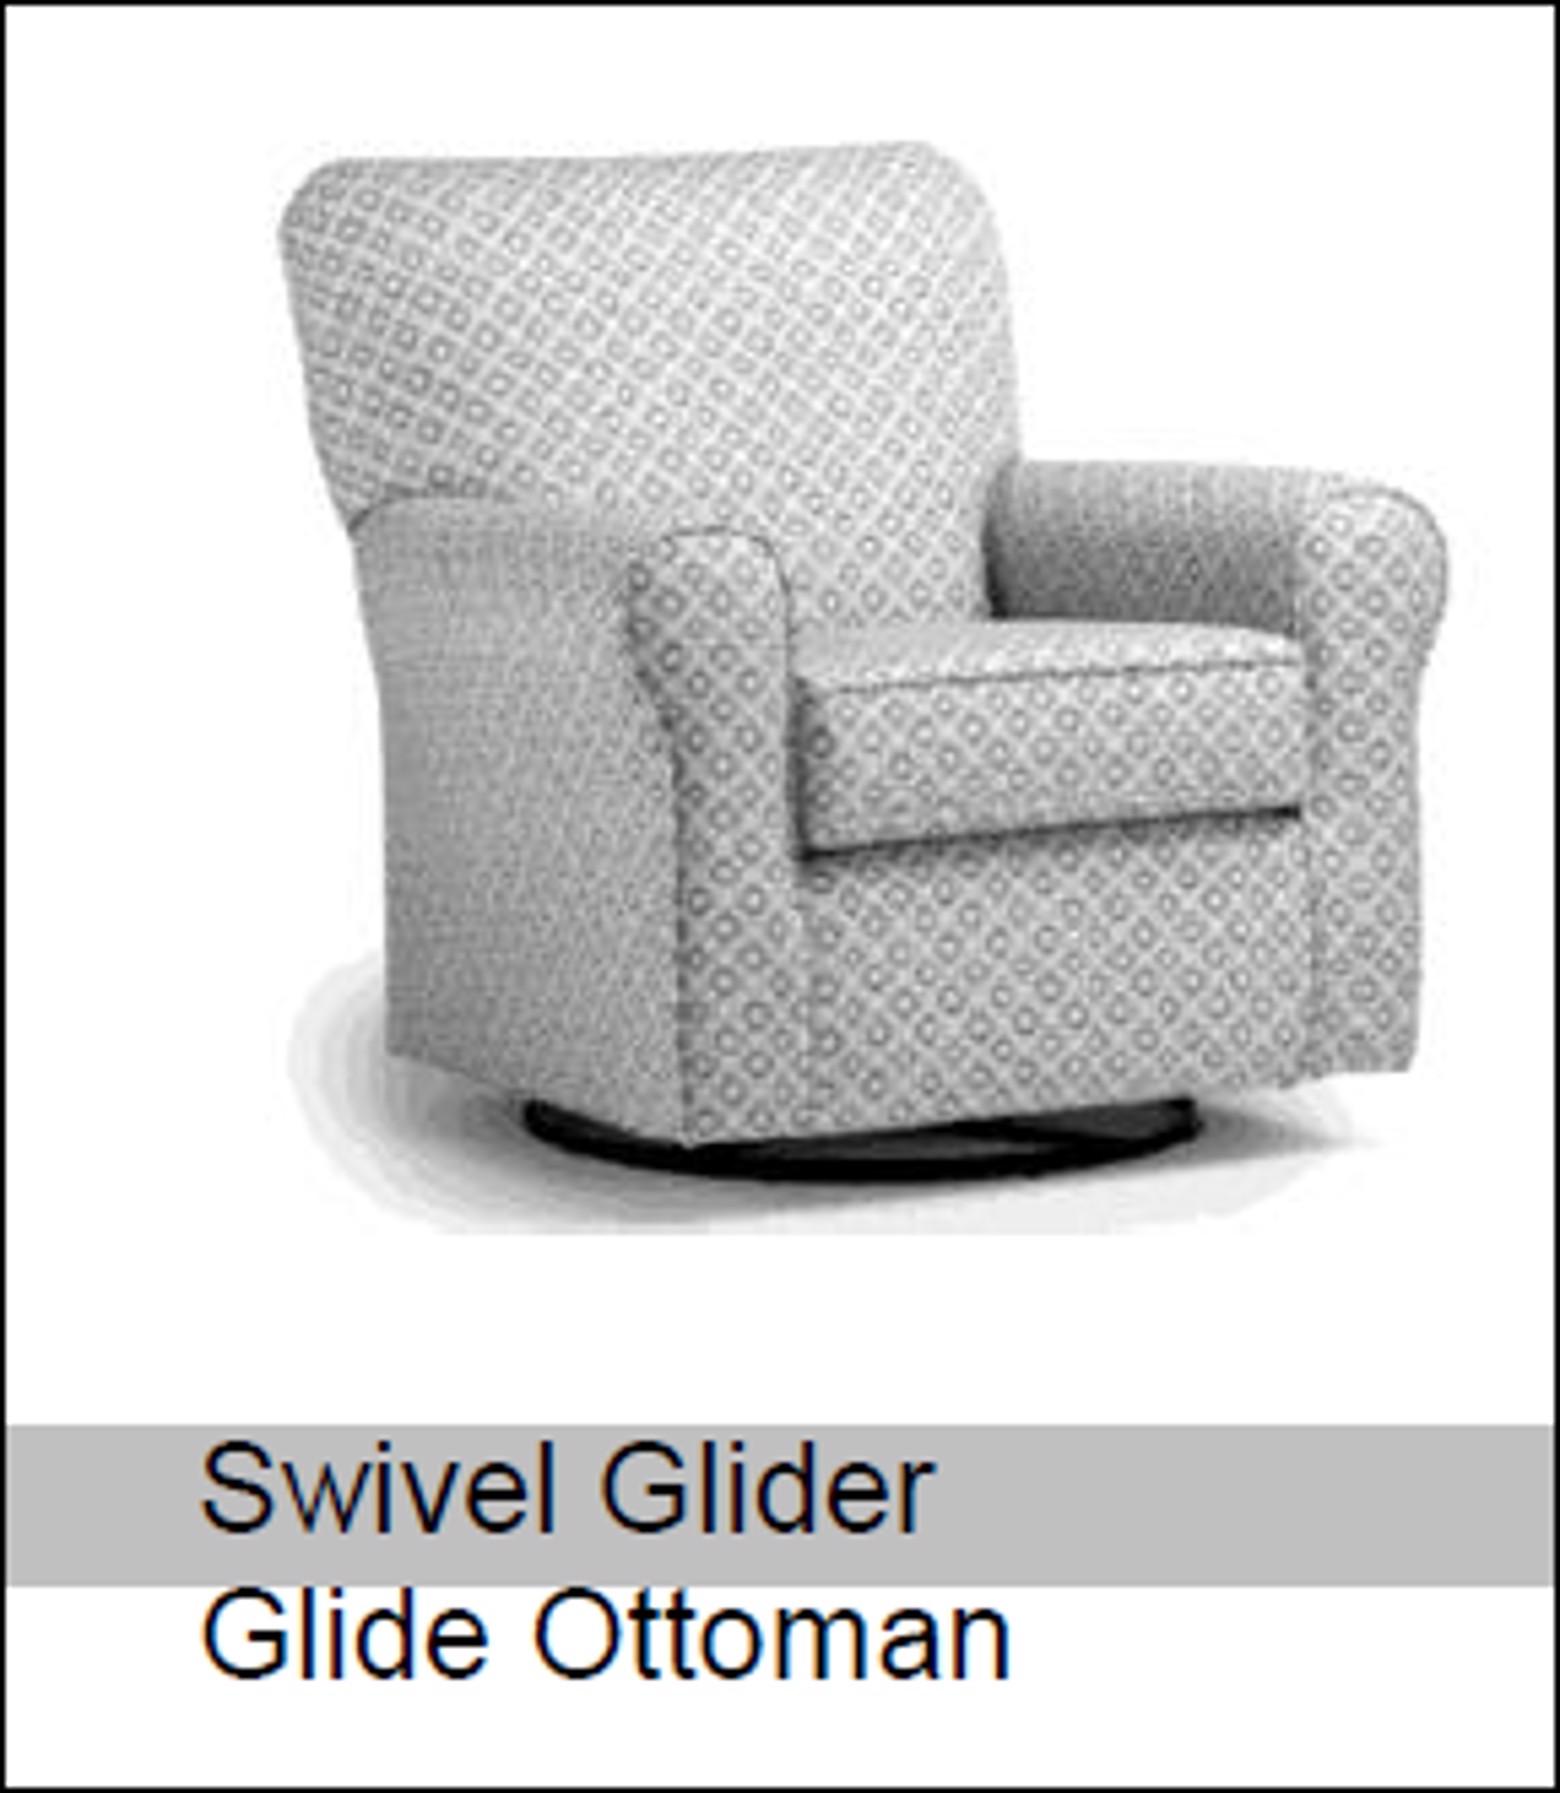 glider.PNG image